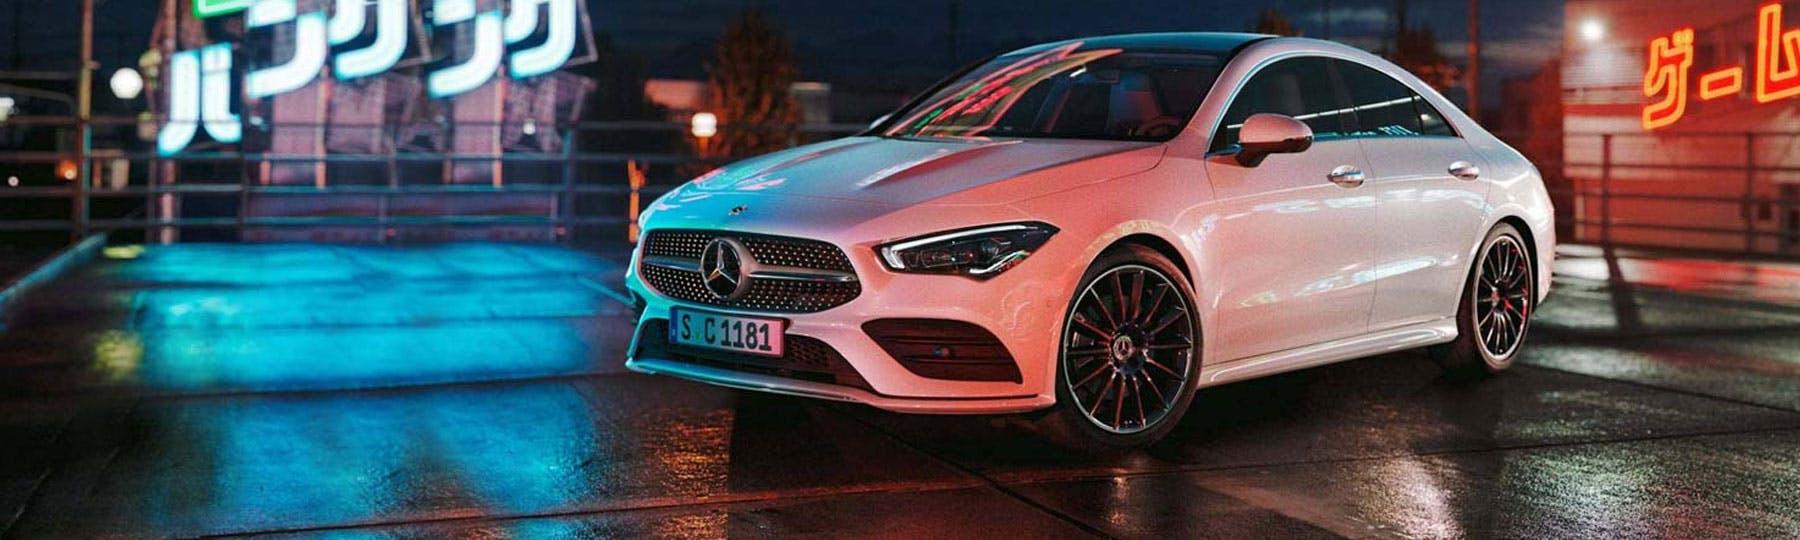 Mercedes-Benz CLA Coupé Motability